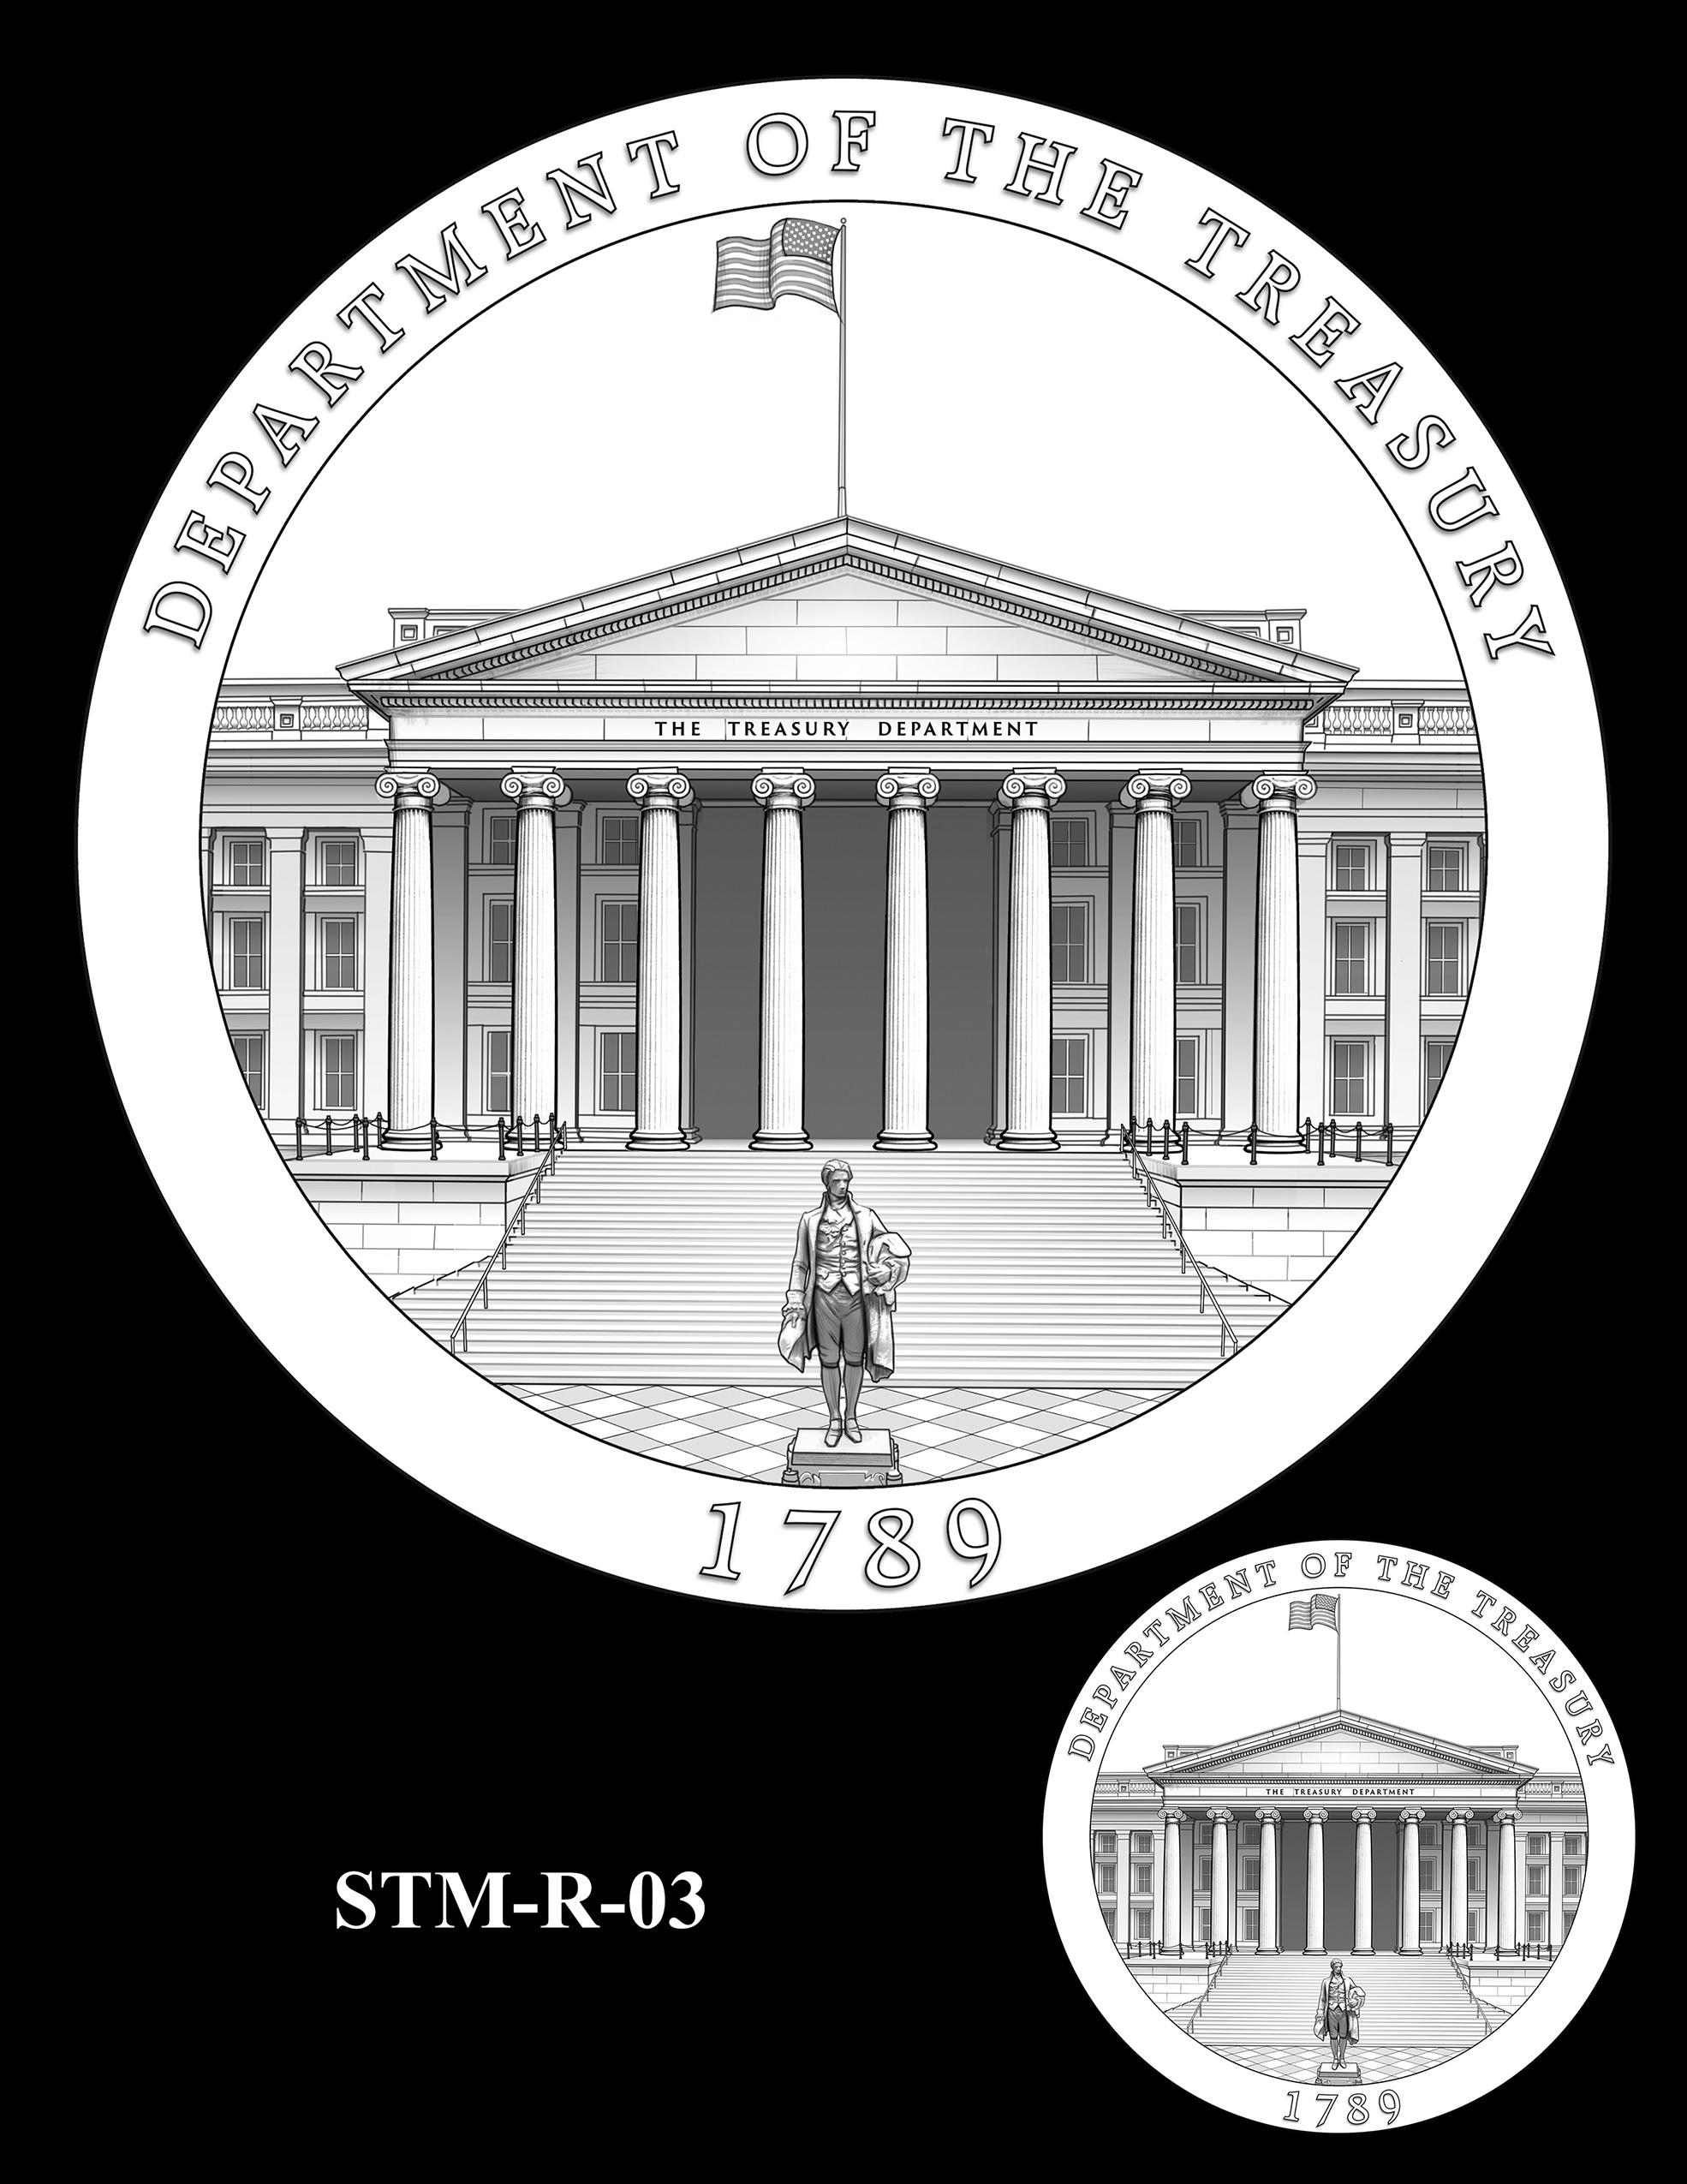 STM-R-03 -- Steven T. Mnuchin Secretary of the Treasury Medal